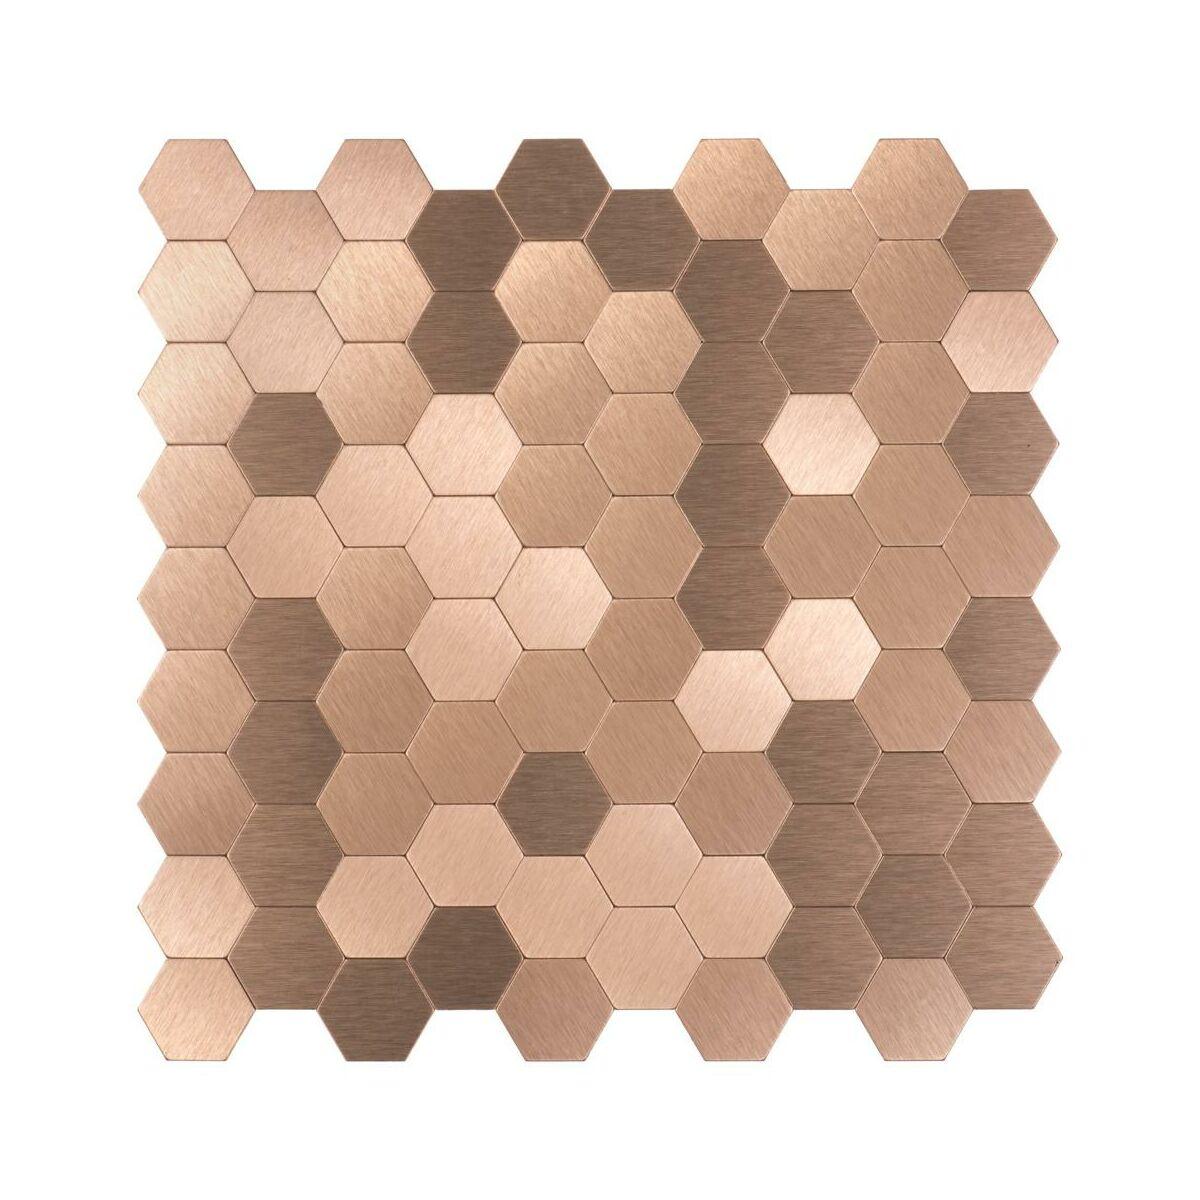 Mozaika Plast 292 X 288 Artens